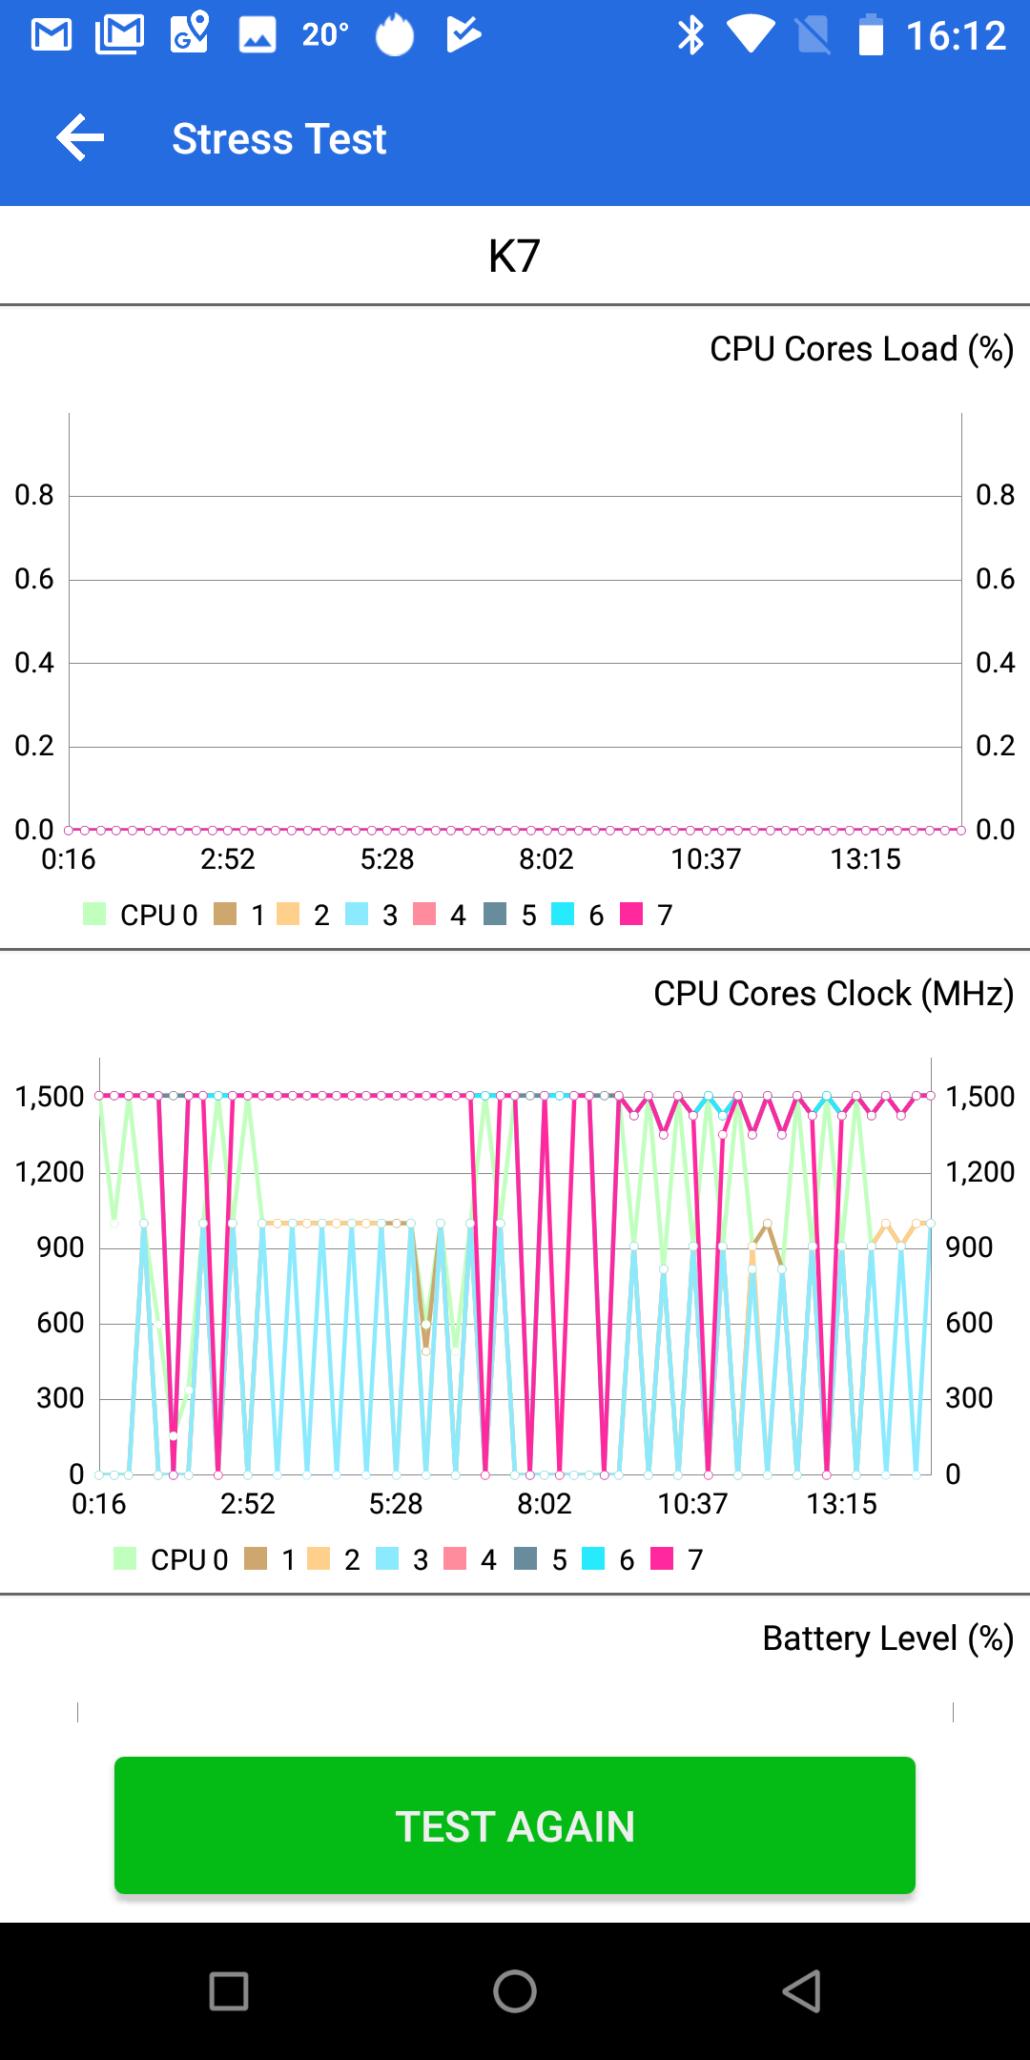 oukitel-k7-phone-review-06-part-7-geekbench-stress-test-part-2